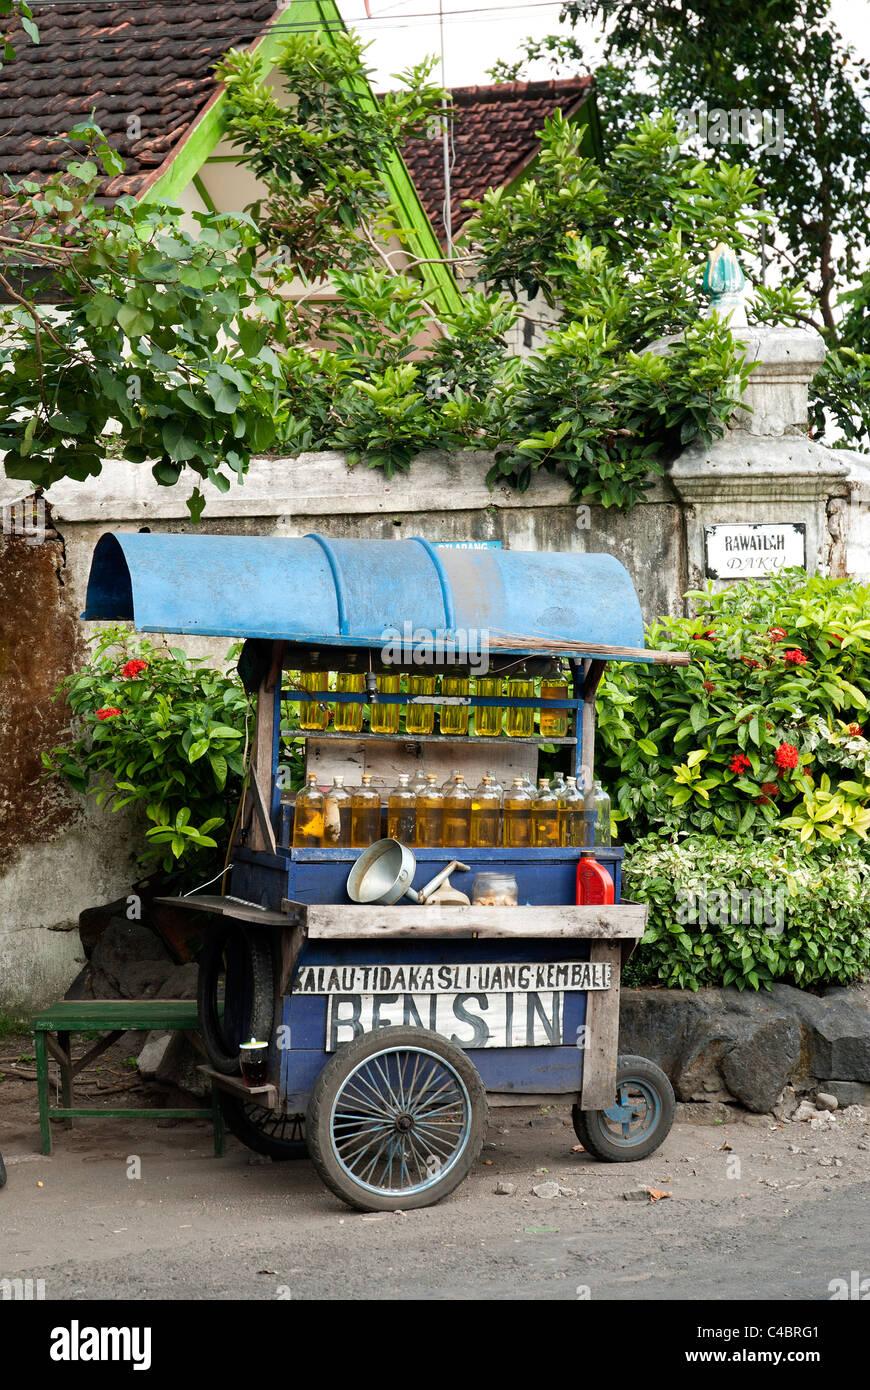 petrol gasoline street stall in surakarta indonesia - Stock Image